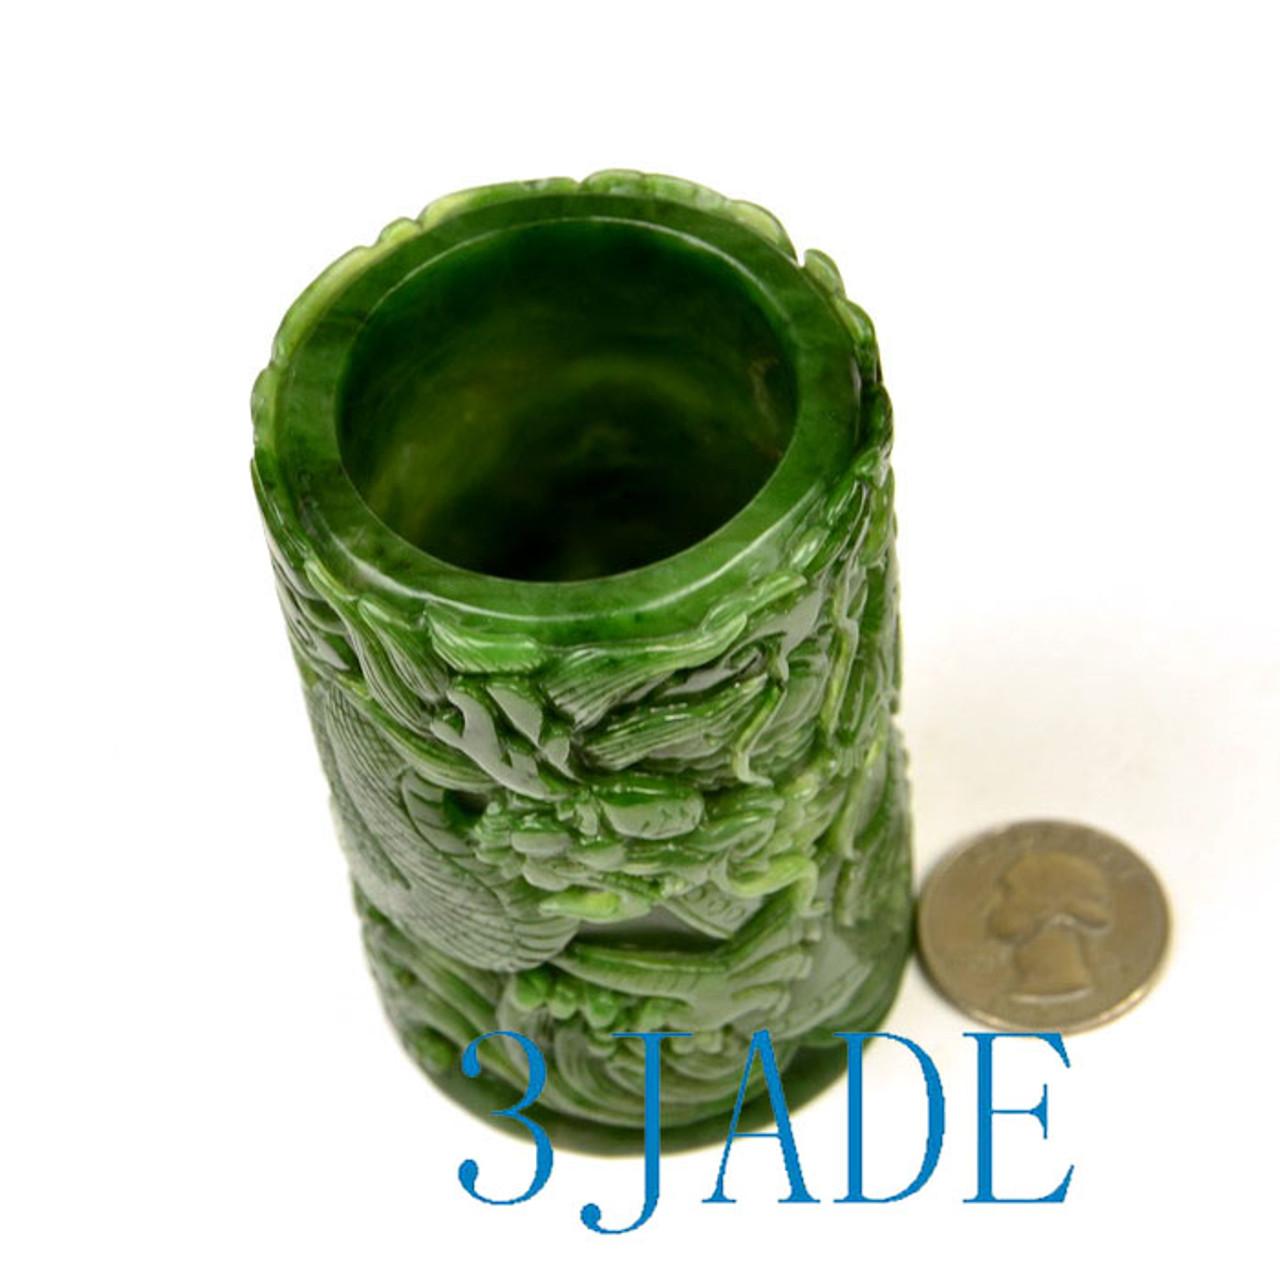 jade brush holder